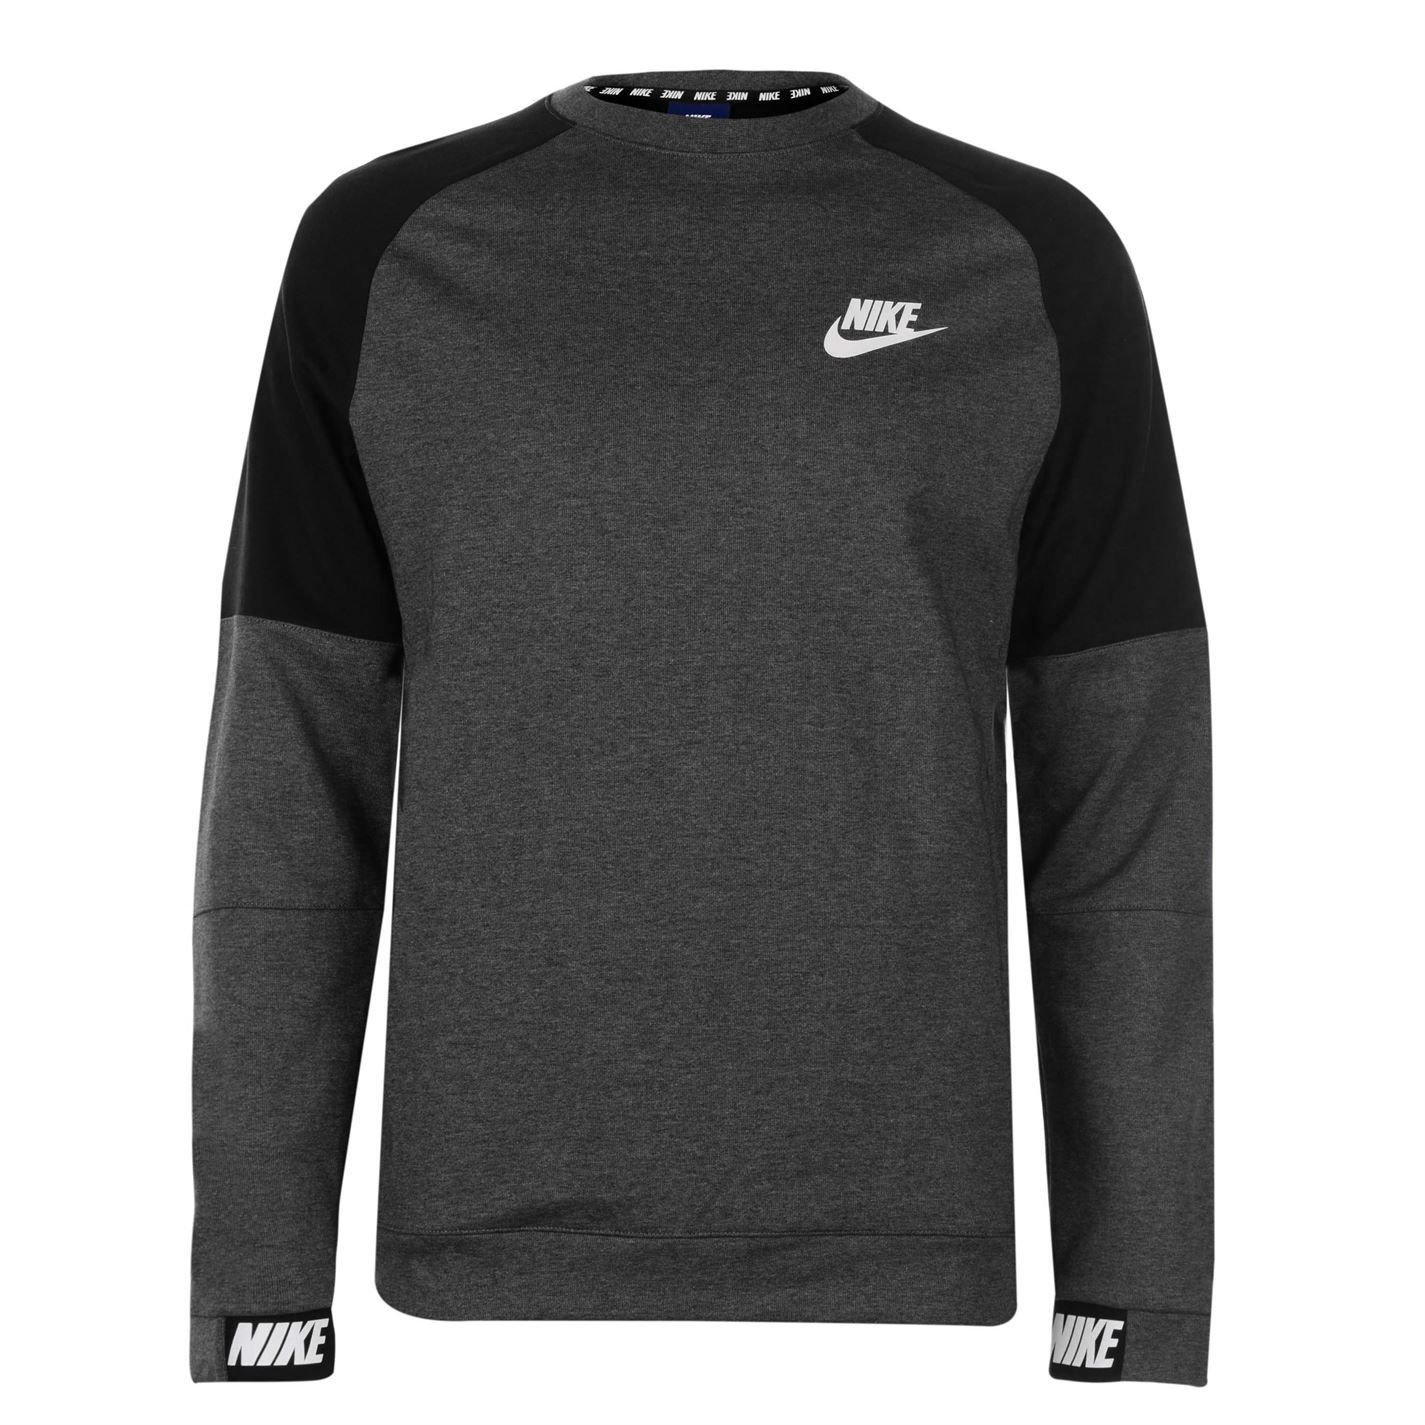 Nike JumperEbay Sweatshirt Sweater Neck Mens Av15 Fleece Crew Top UjzMpLqSVG